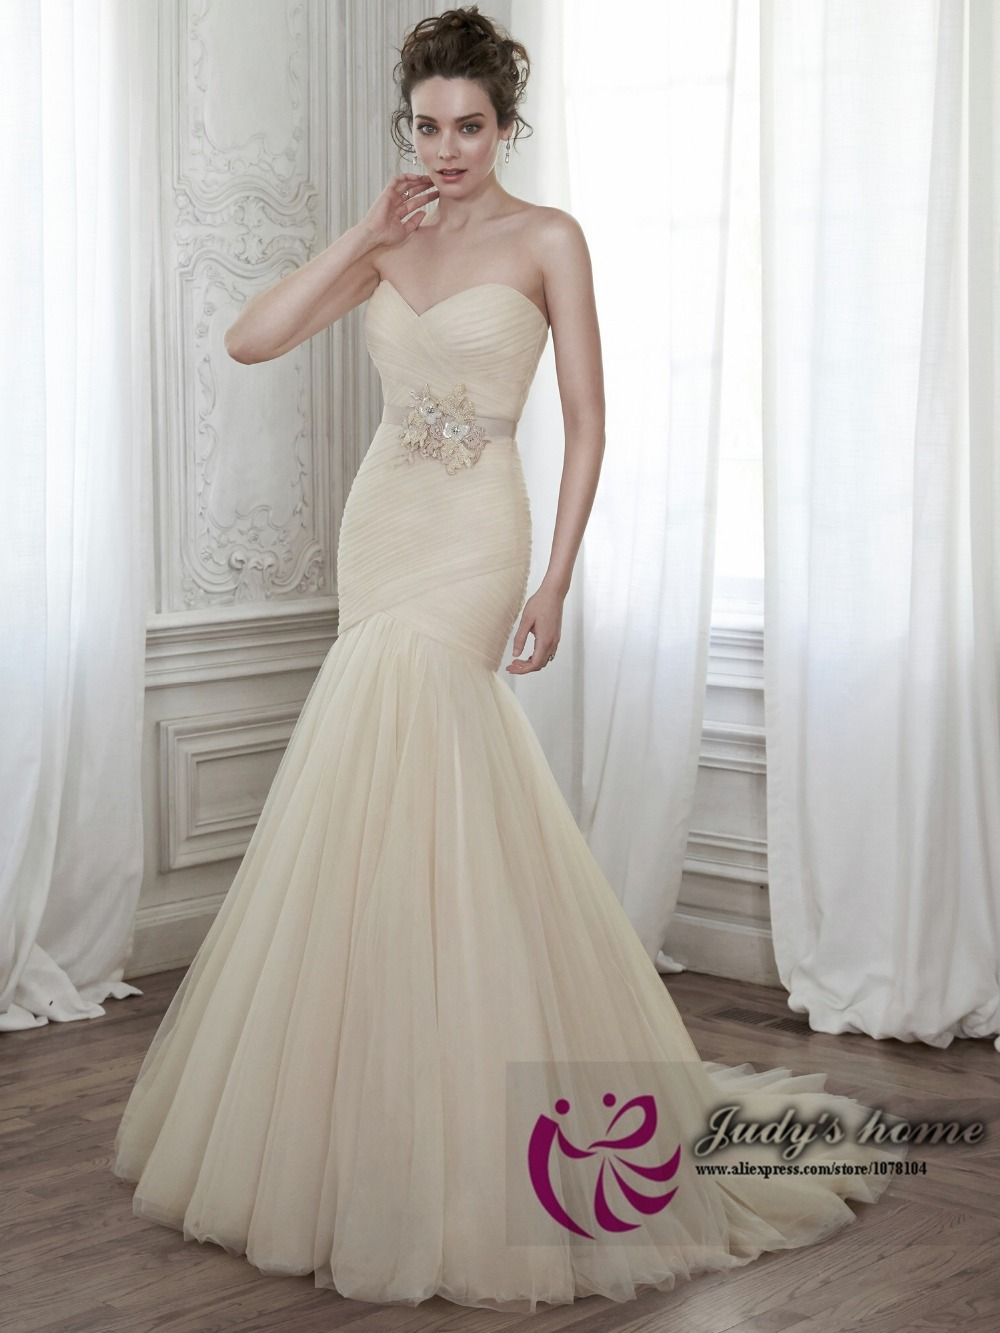 find elegant simple wedding dress simple elegant wedding dress Find Elegant Simple Wedding Dress